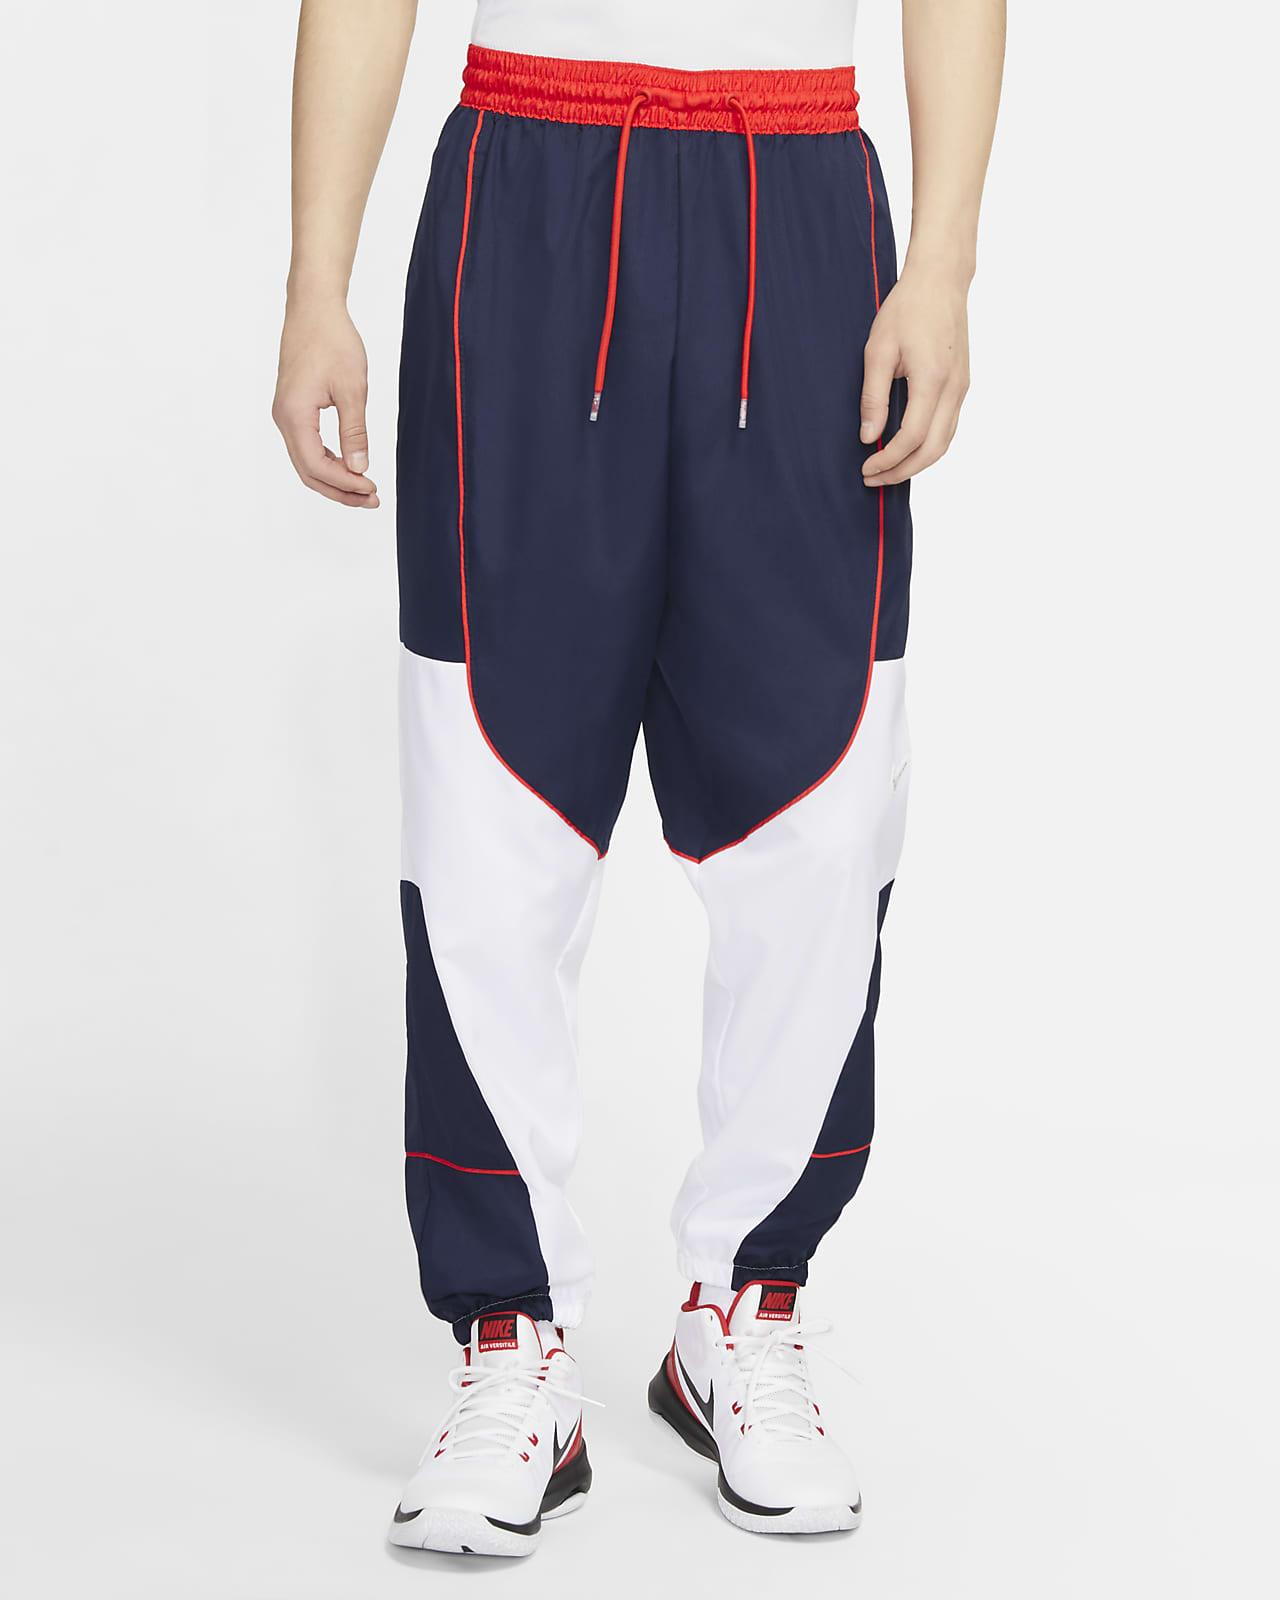 Nike Throwback 男子篮球长裤